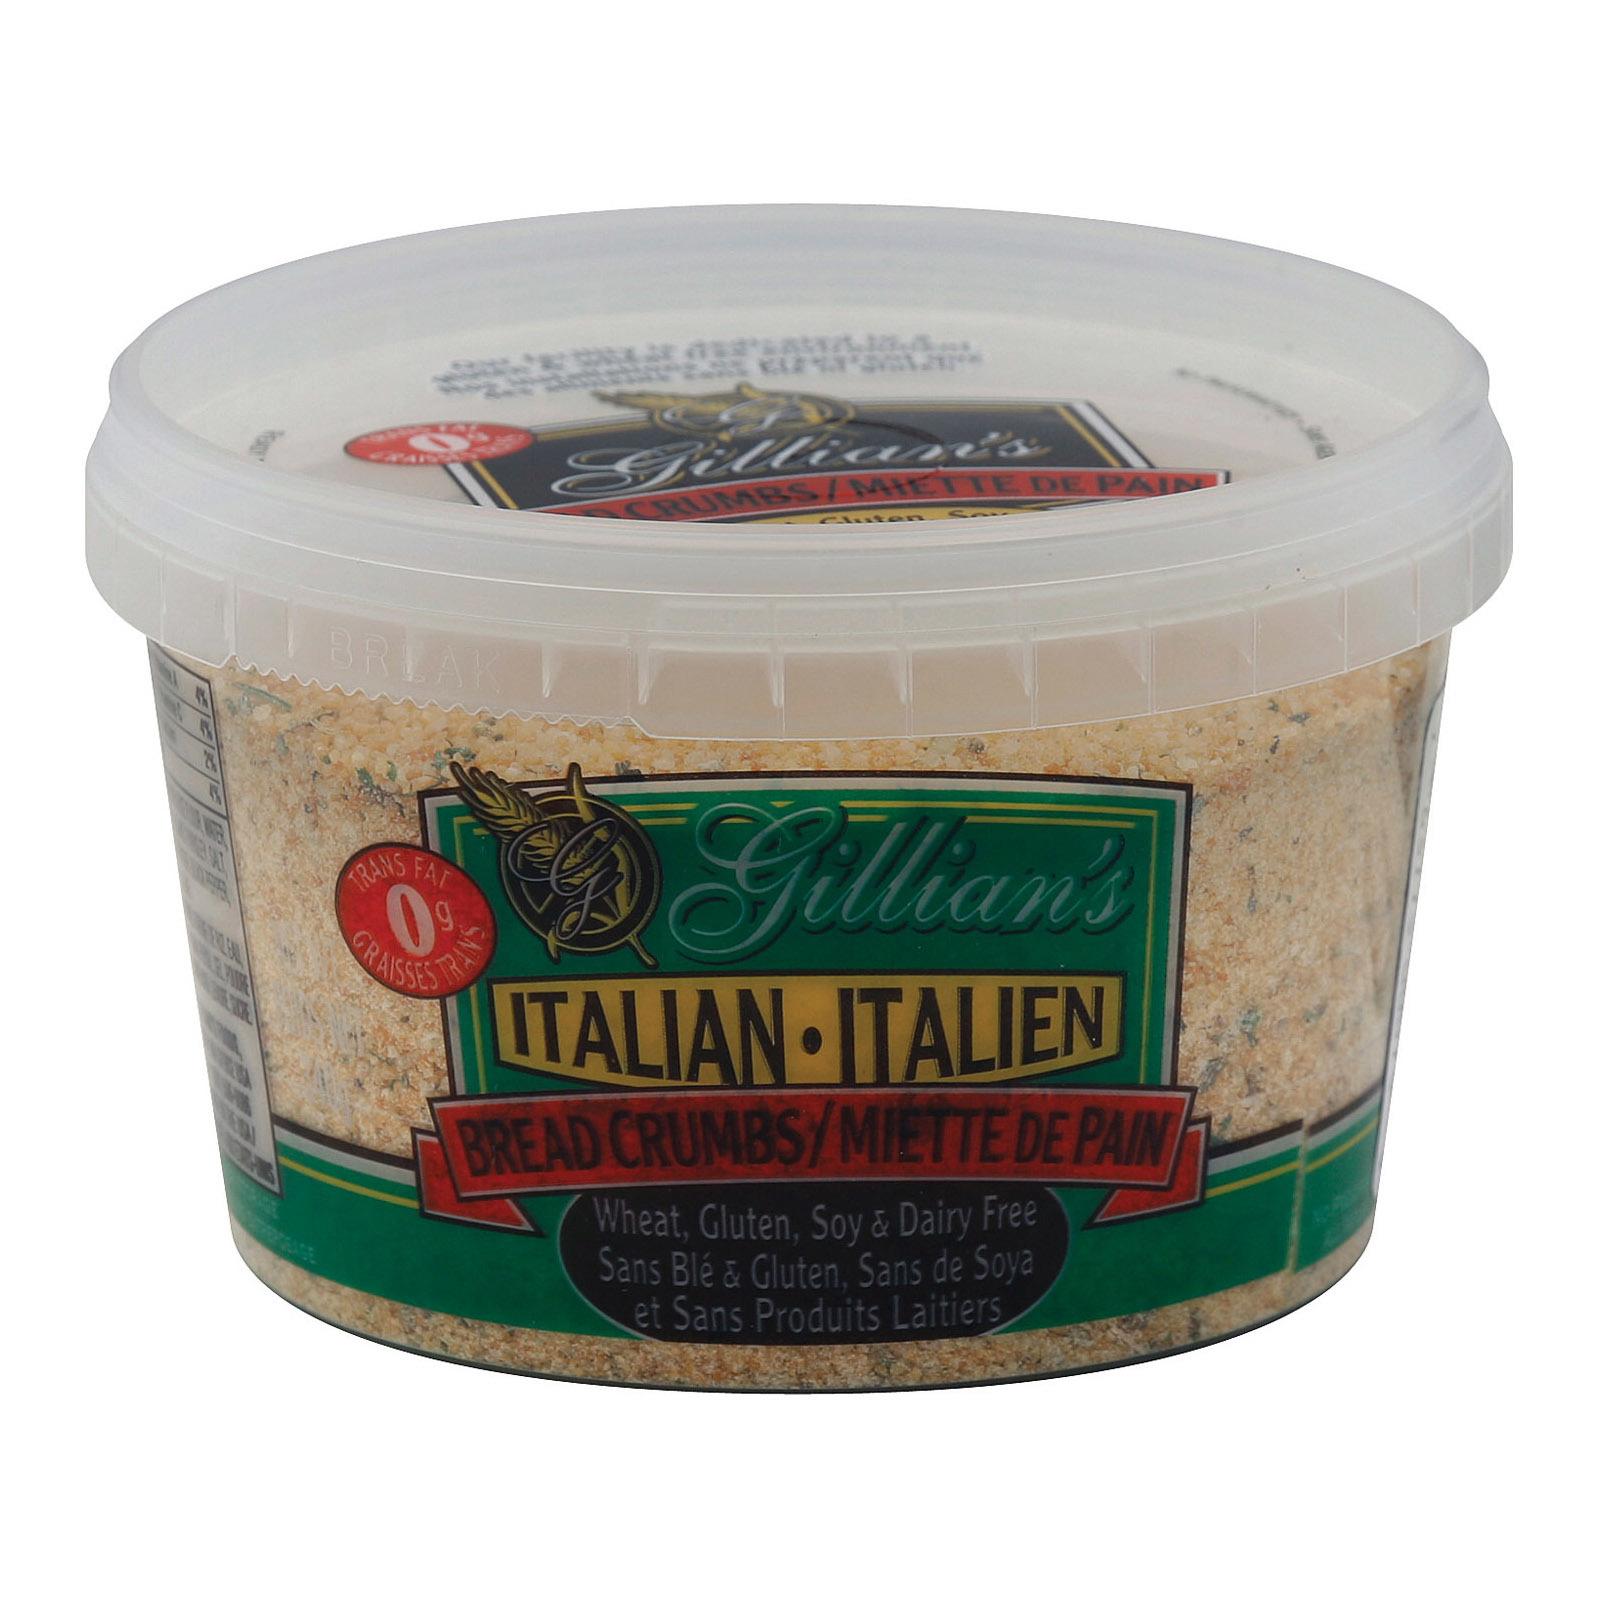 Gillian's Food Bread Crumbs - Italian Style - Case of 12 - 12 oz.